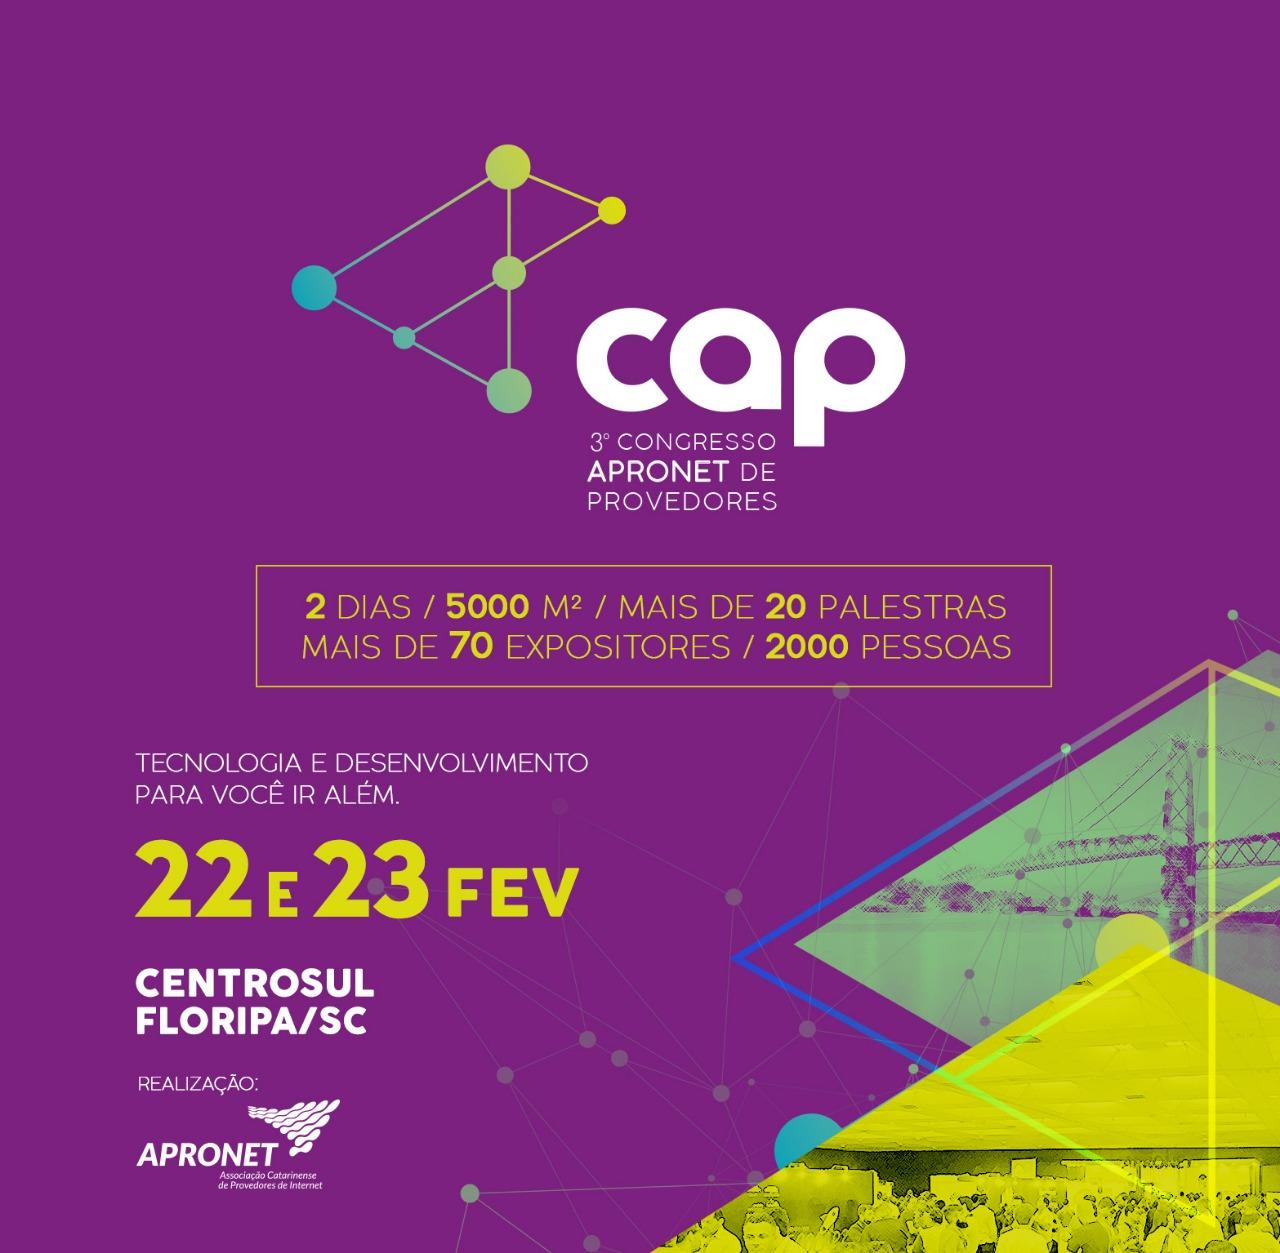 CAP – Congresso Apronet de Provedores